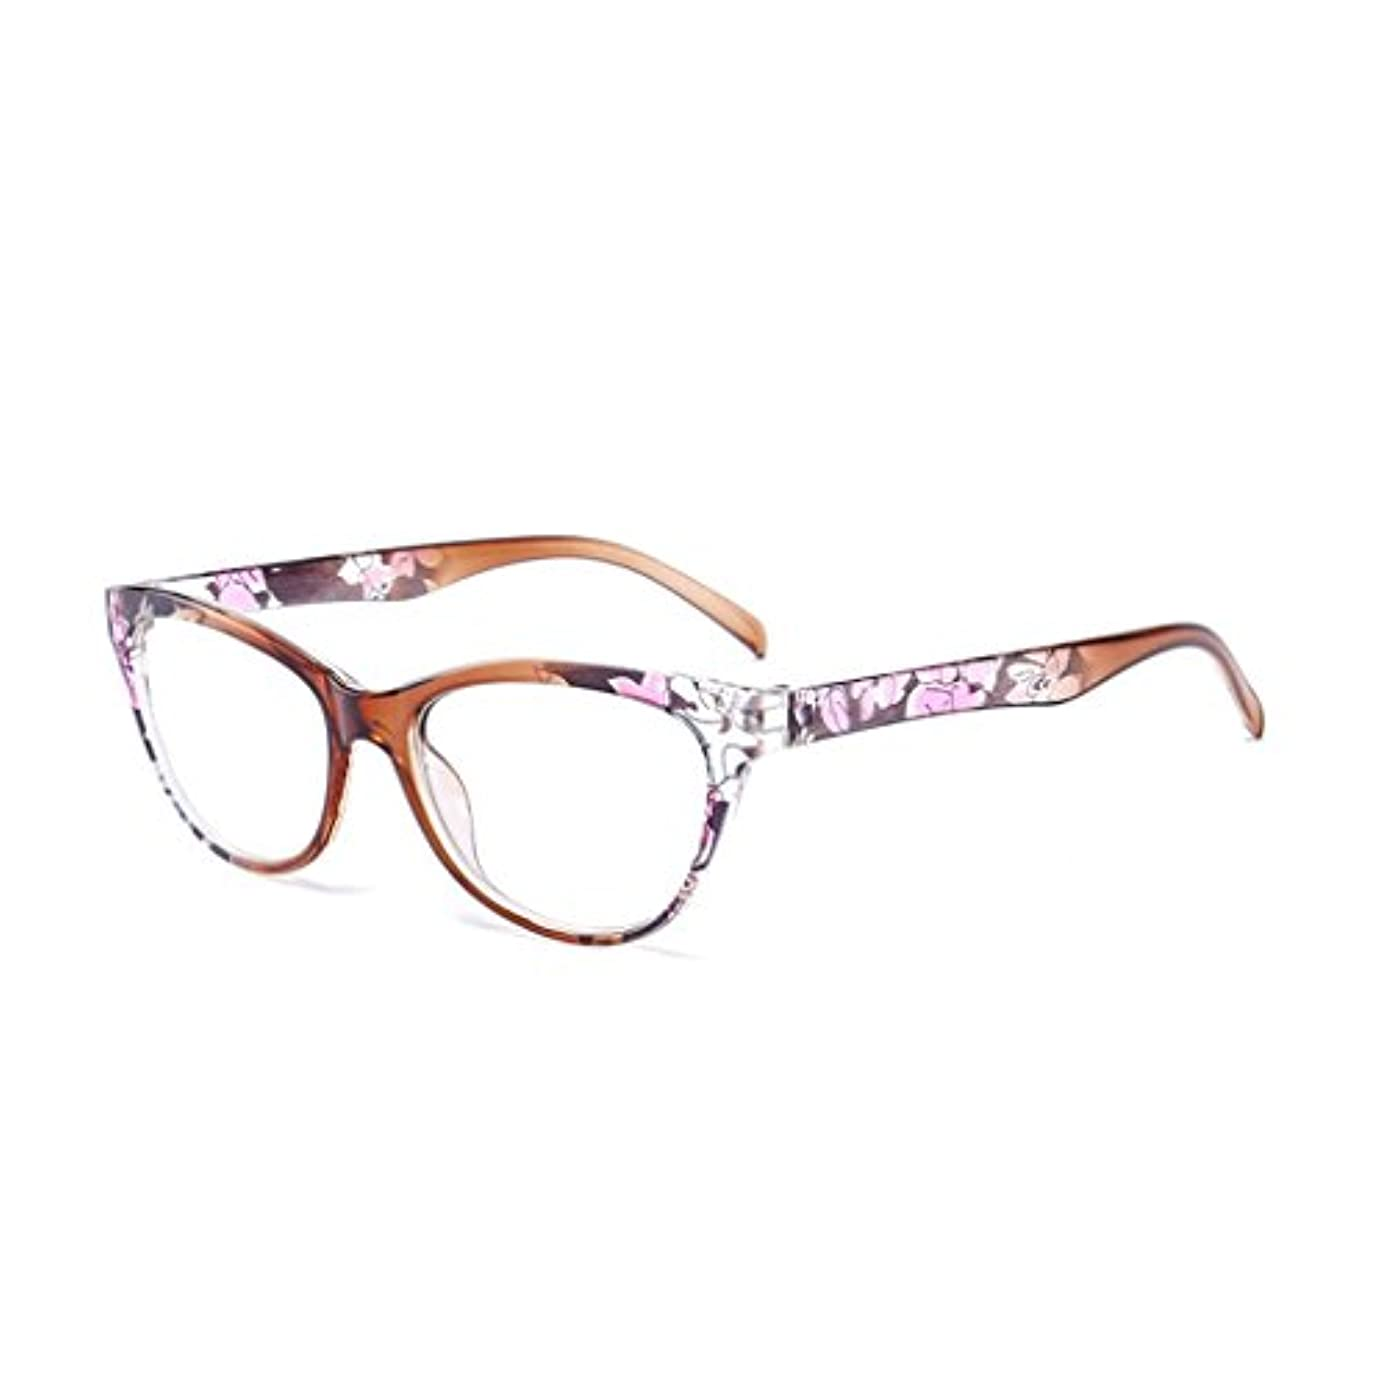 Manyao Women Cat Eye Reading Glasses Vintage Reader Fashion Flower Print +1.0-+4.0 (ブラウン, 100)